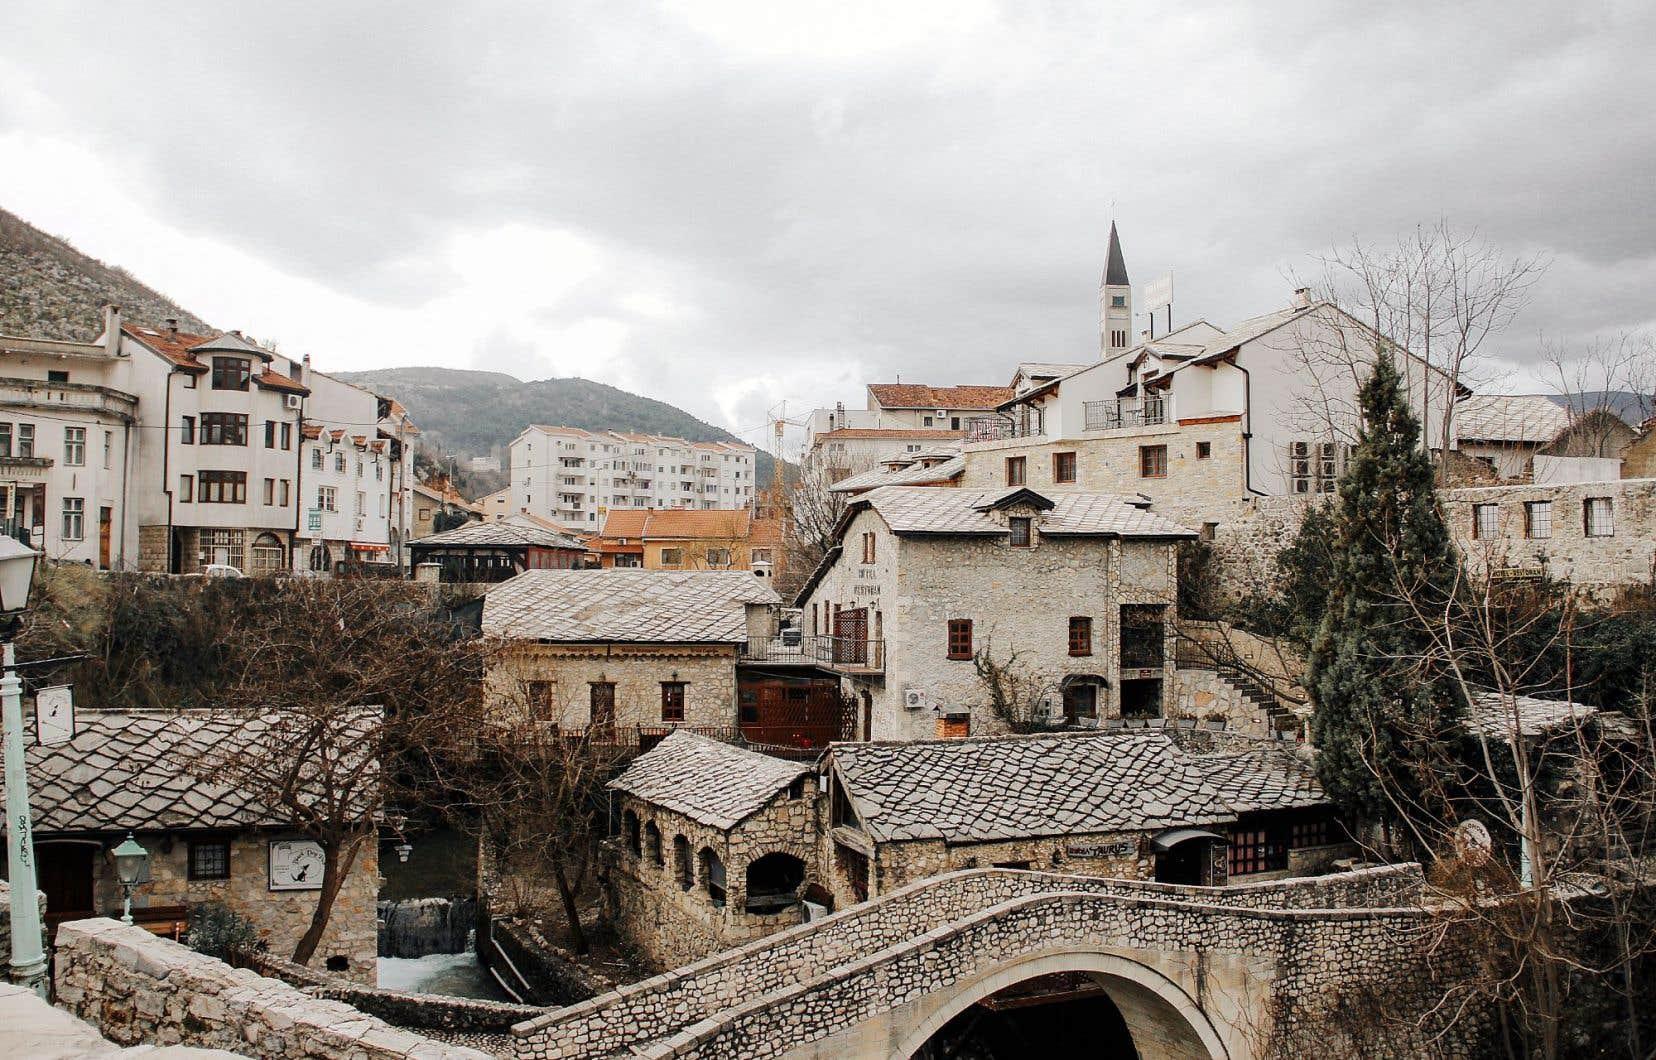 La ville de Mostar en Bosnie-Herzégovine